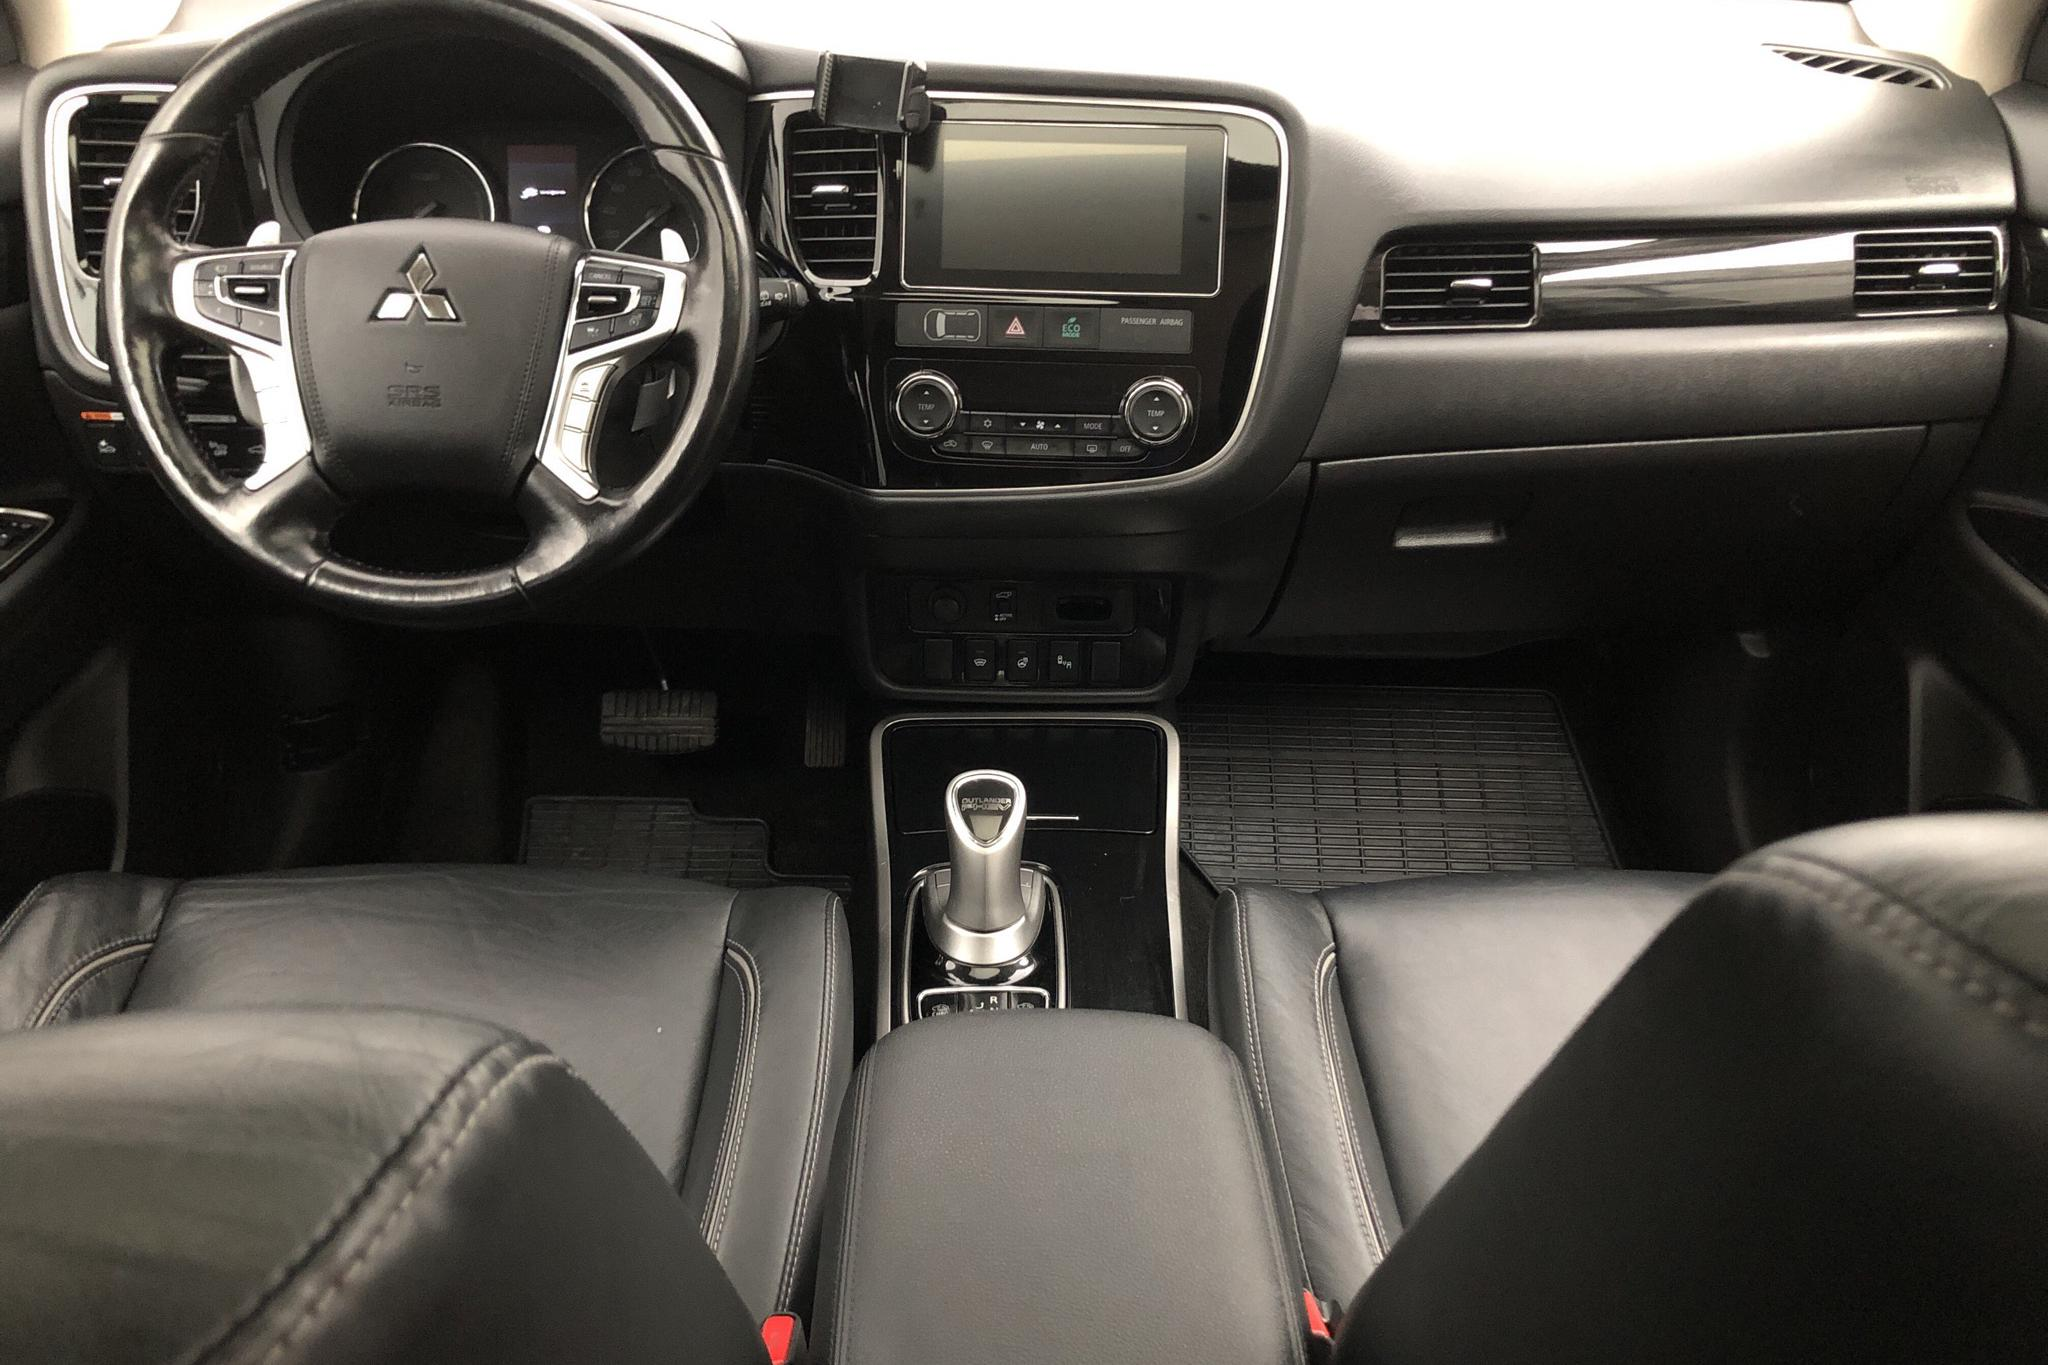 Mitsubishi Outlander 2.0 Plug-in Hybrid 4WD (121hk) - 108 390 km - Automatic - gray - 2017